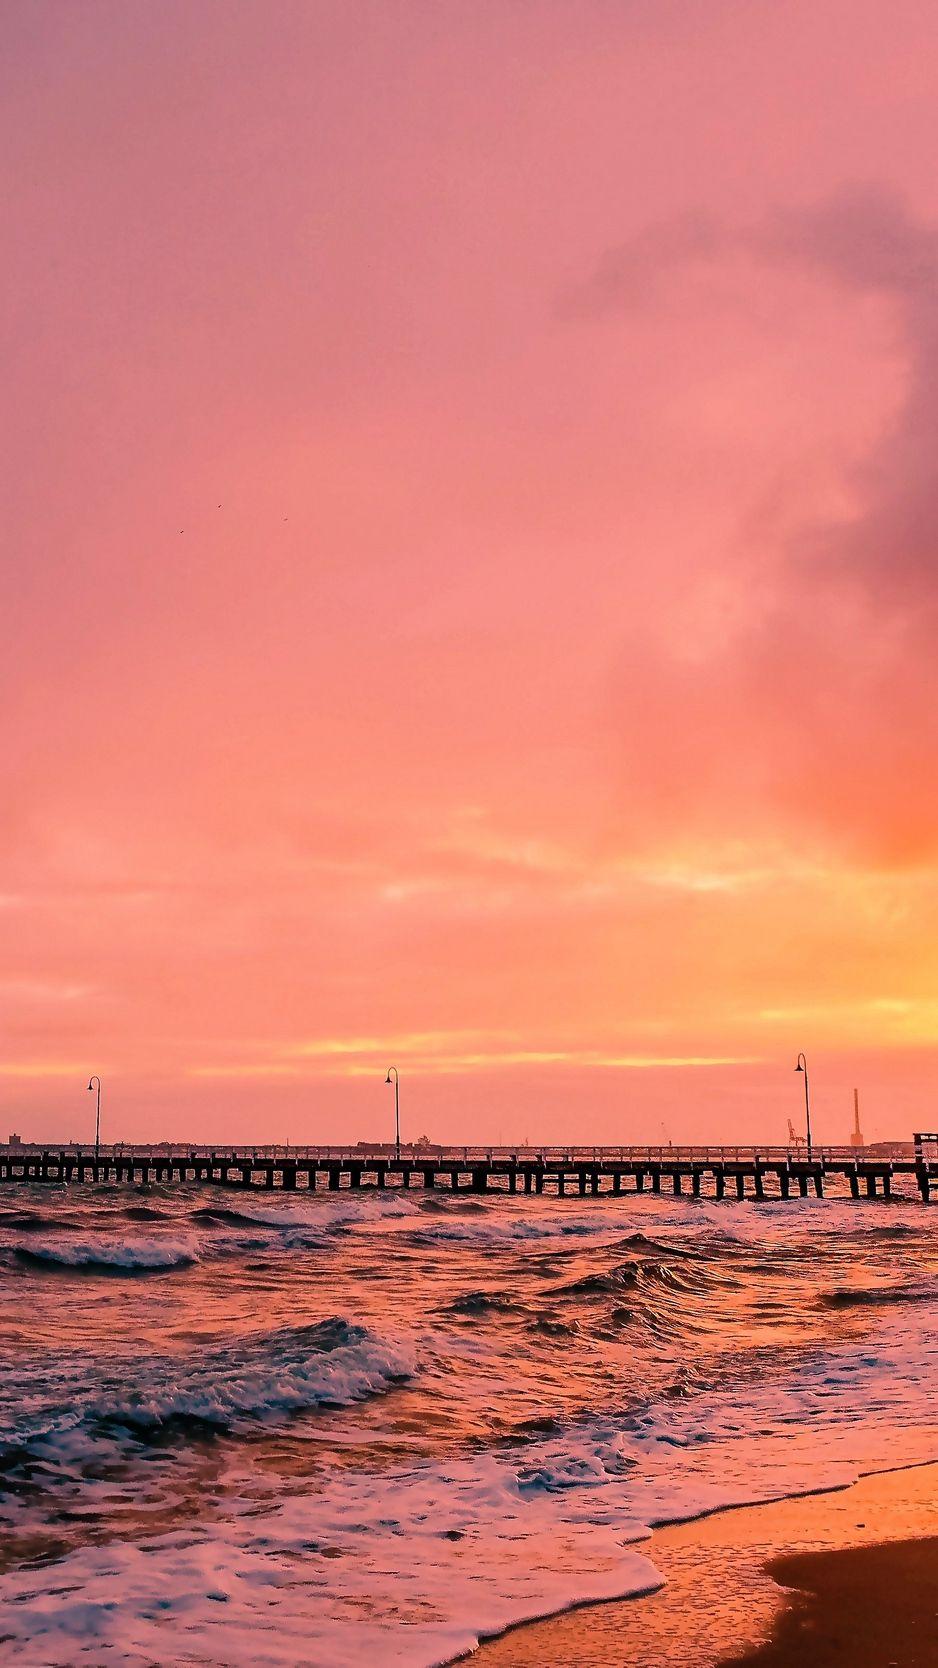 Download Wallpaper 938x1668 Sunset Sea Sun Landscape Iphone 8 7 6s 6 For Parallax Hd Background Landscape Wallpaper Beach Sunset Wallpaper Sunset Wallpaper